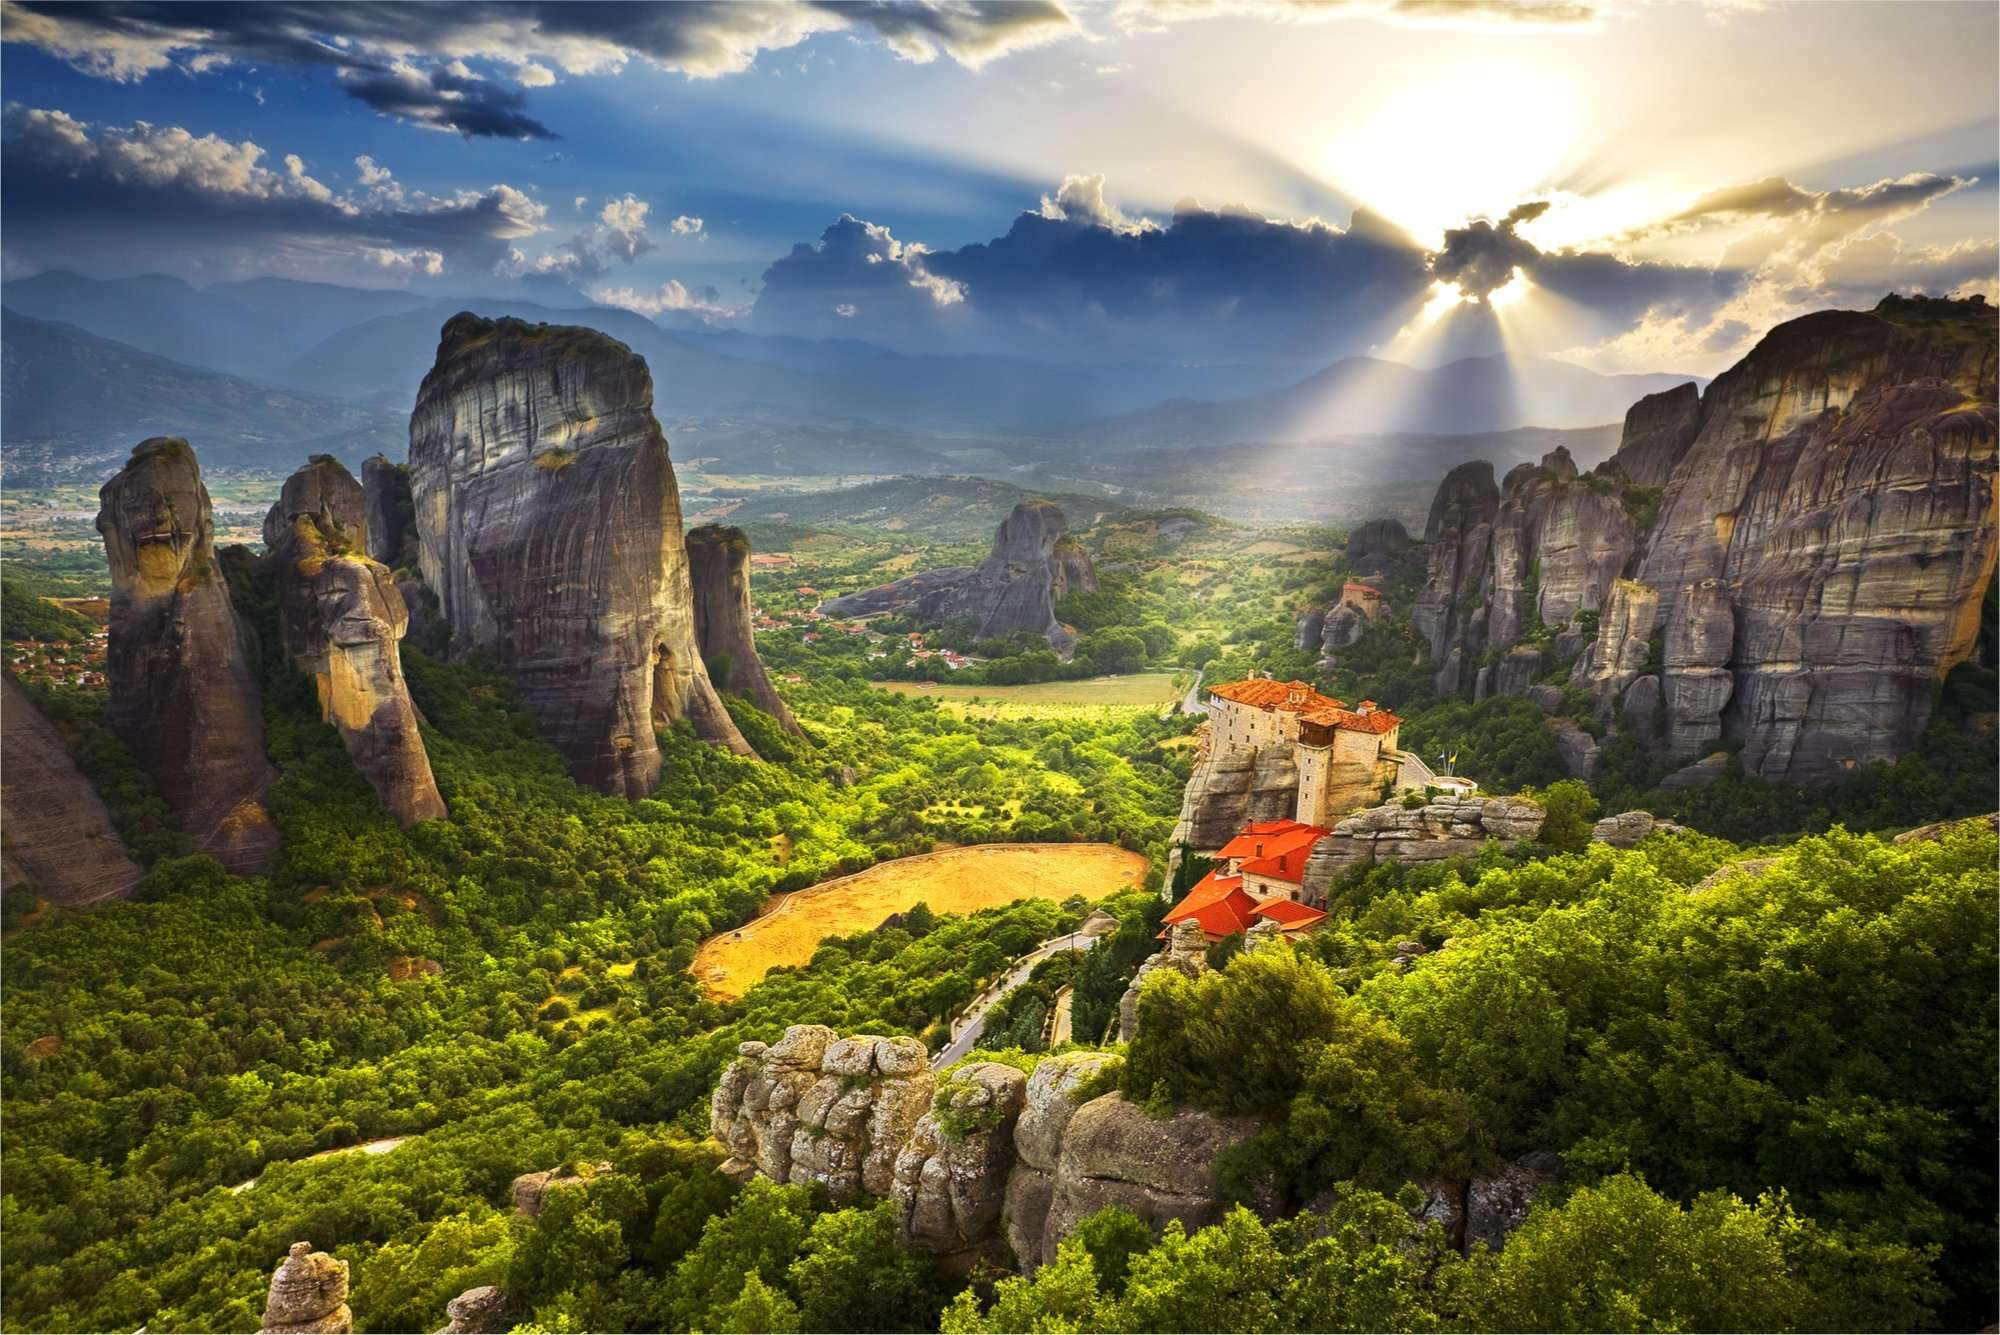 greece walking holidays, walking holidays in greece, self guided walking holidays greece